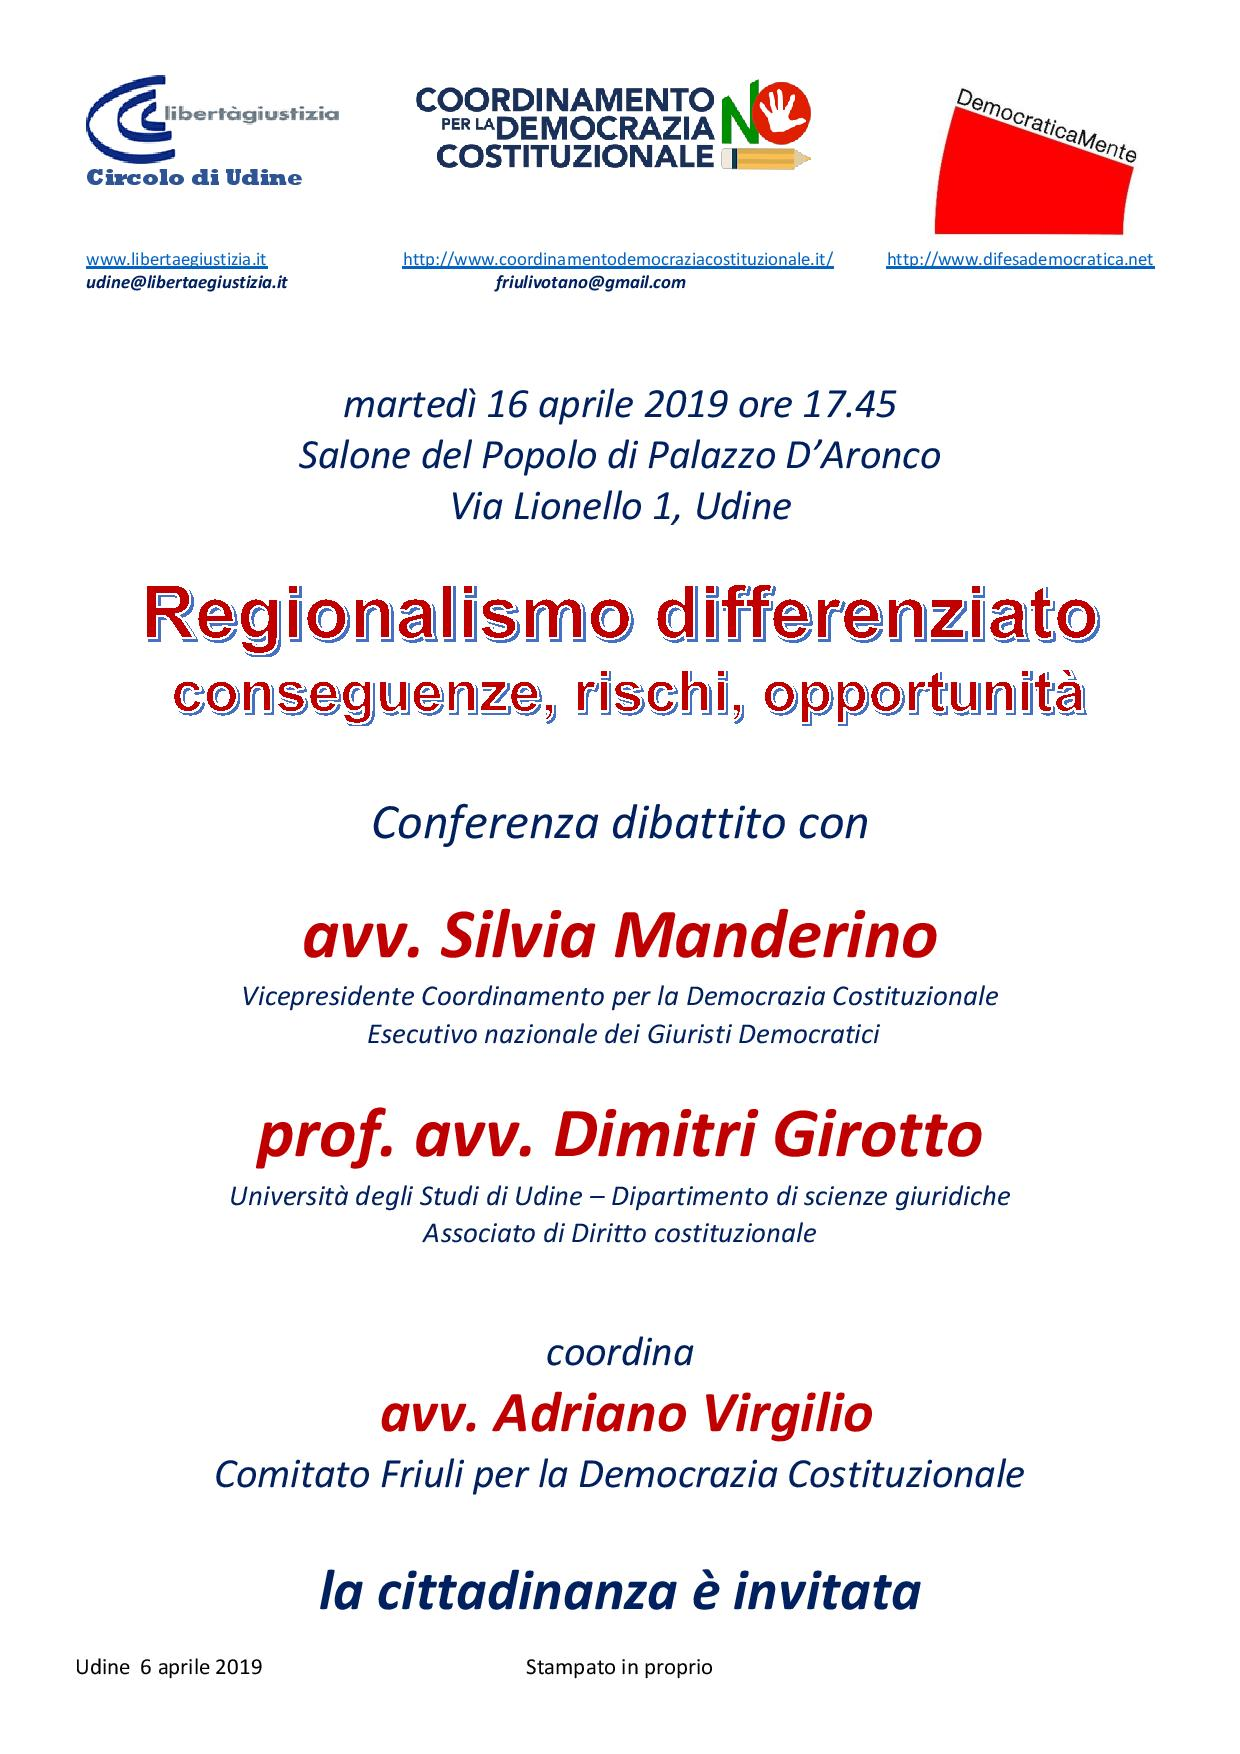 20190416_RegionalismoDifferenziato-page-001